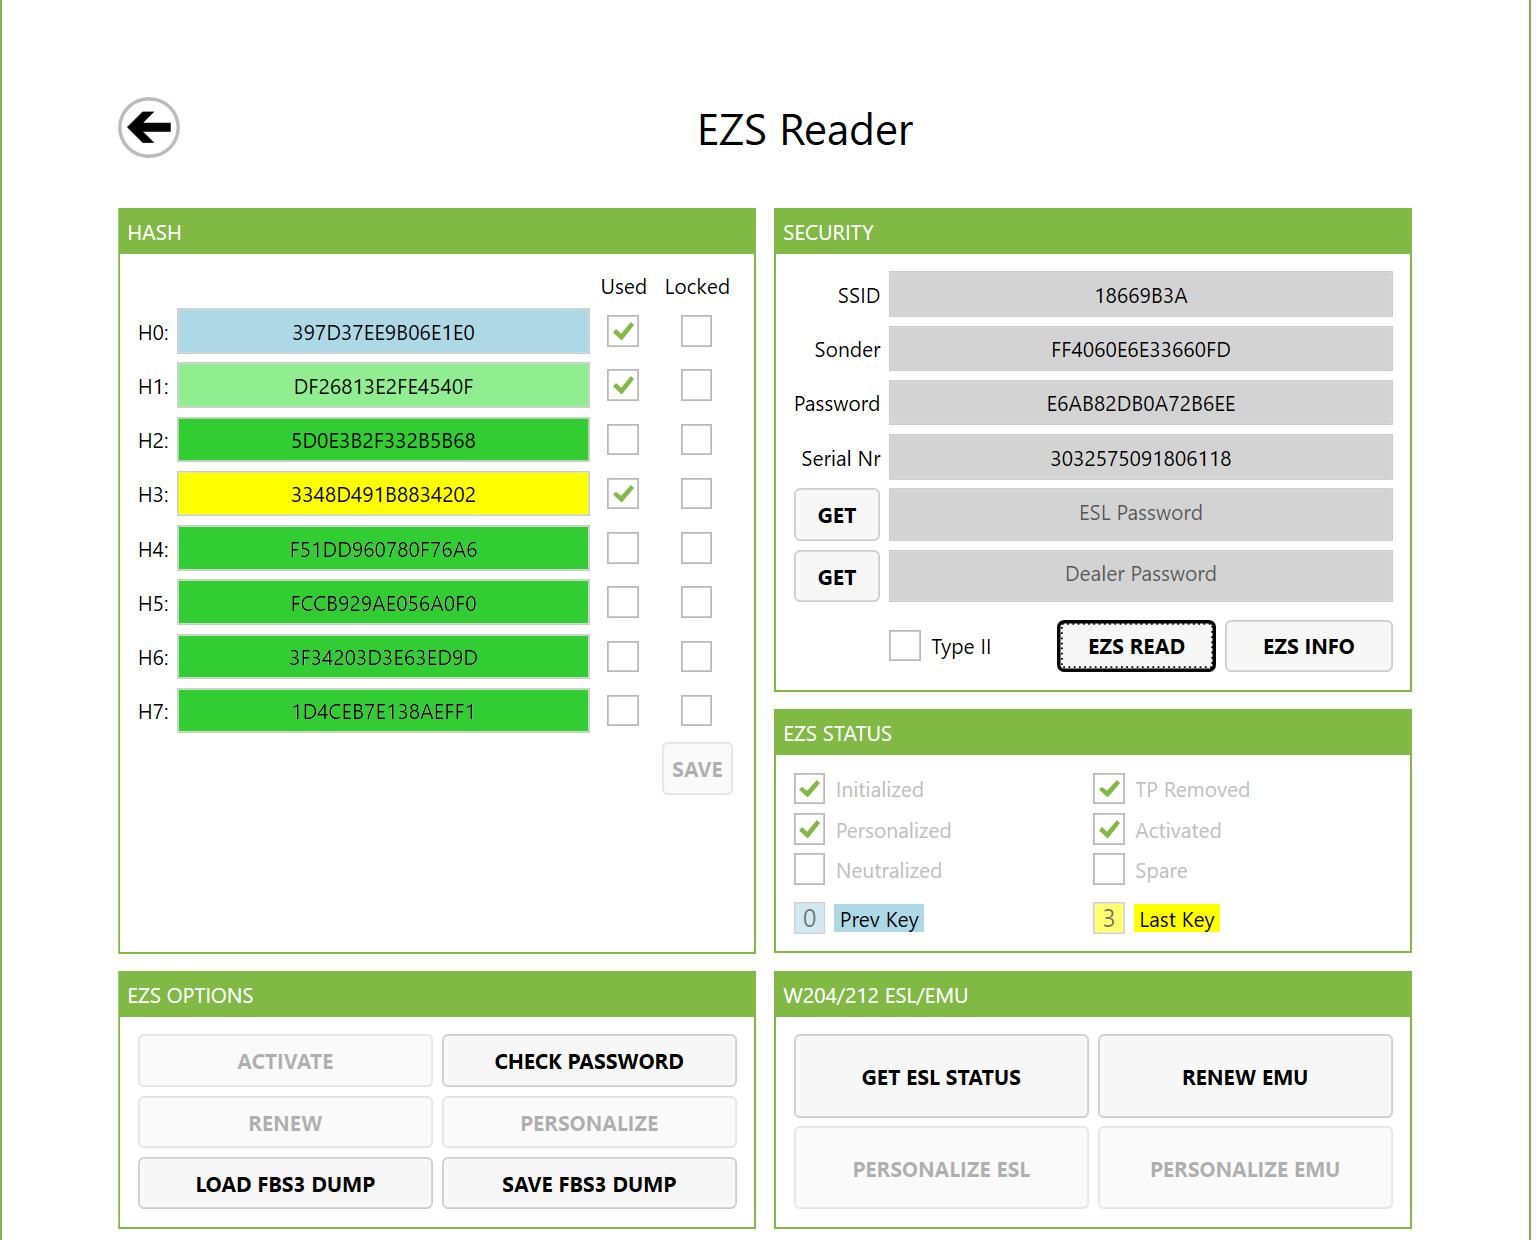 EZS Reader - Extreme Mercedes-Benz tool